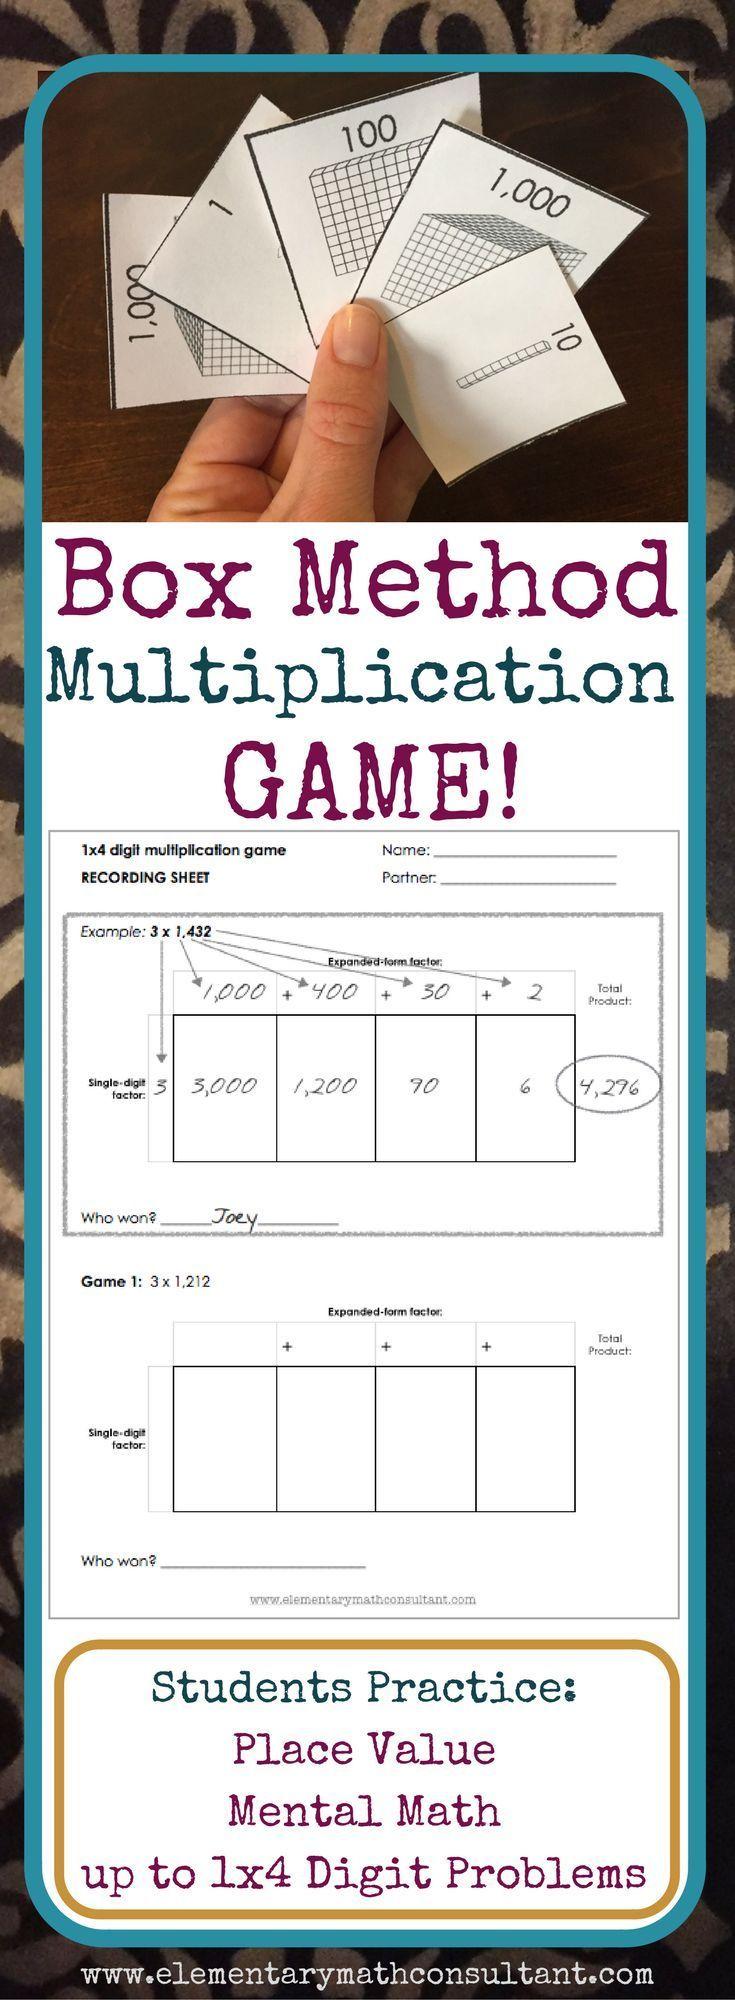 best 25 multiplication strategies ideas on pinterest multiplication teaching multiplication. Black Bedroom Furniture Sets. Home Design Ideas